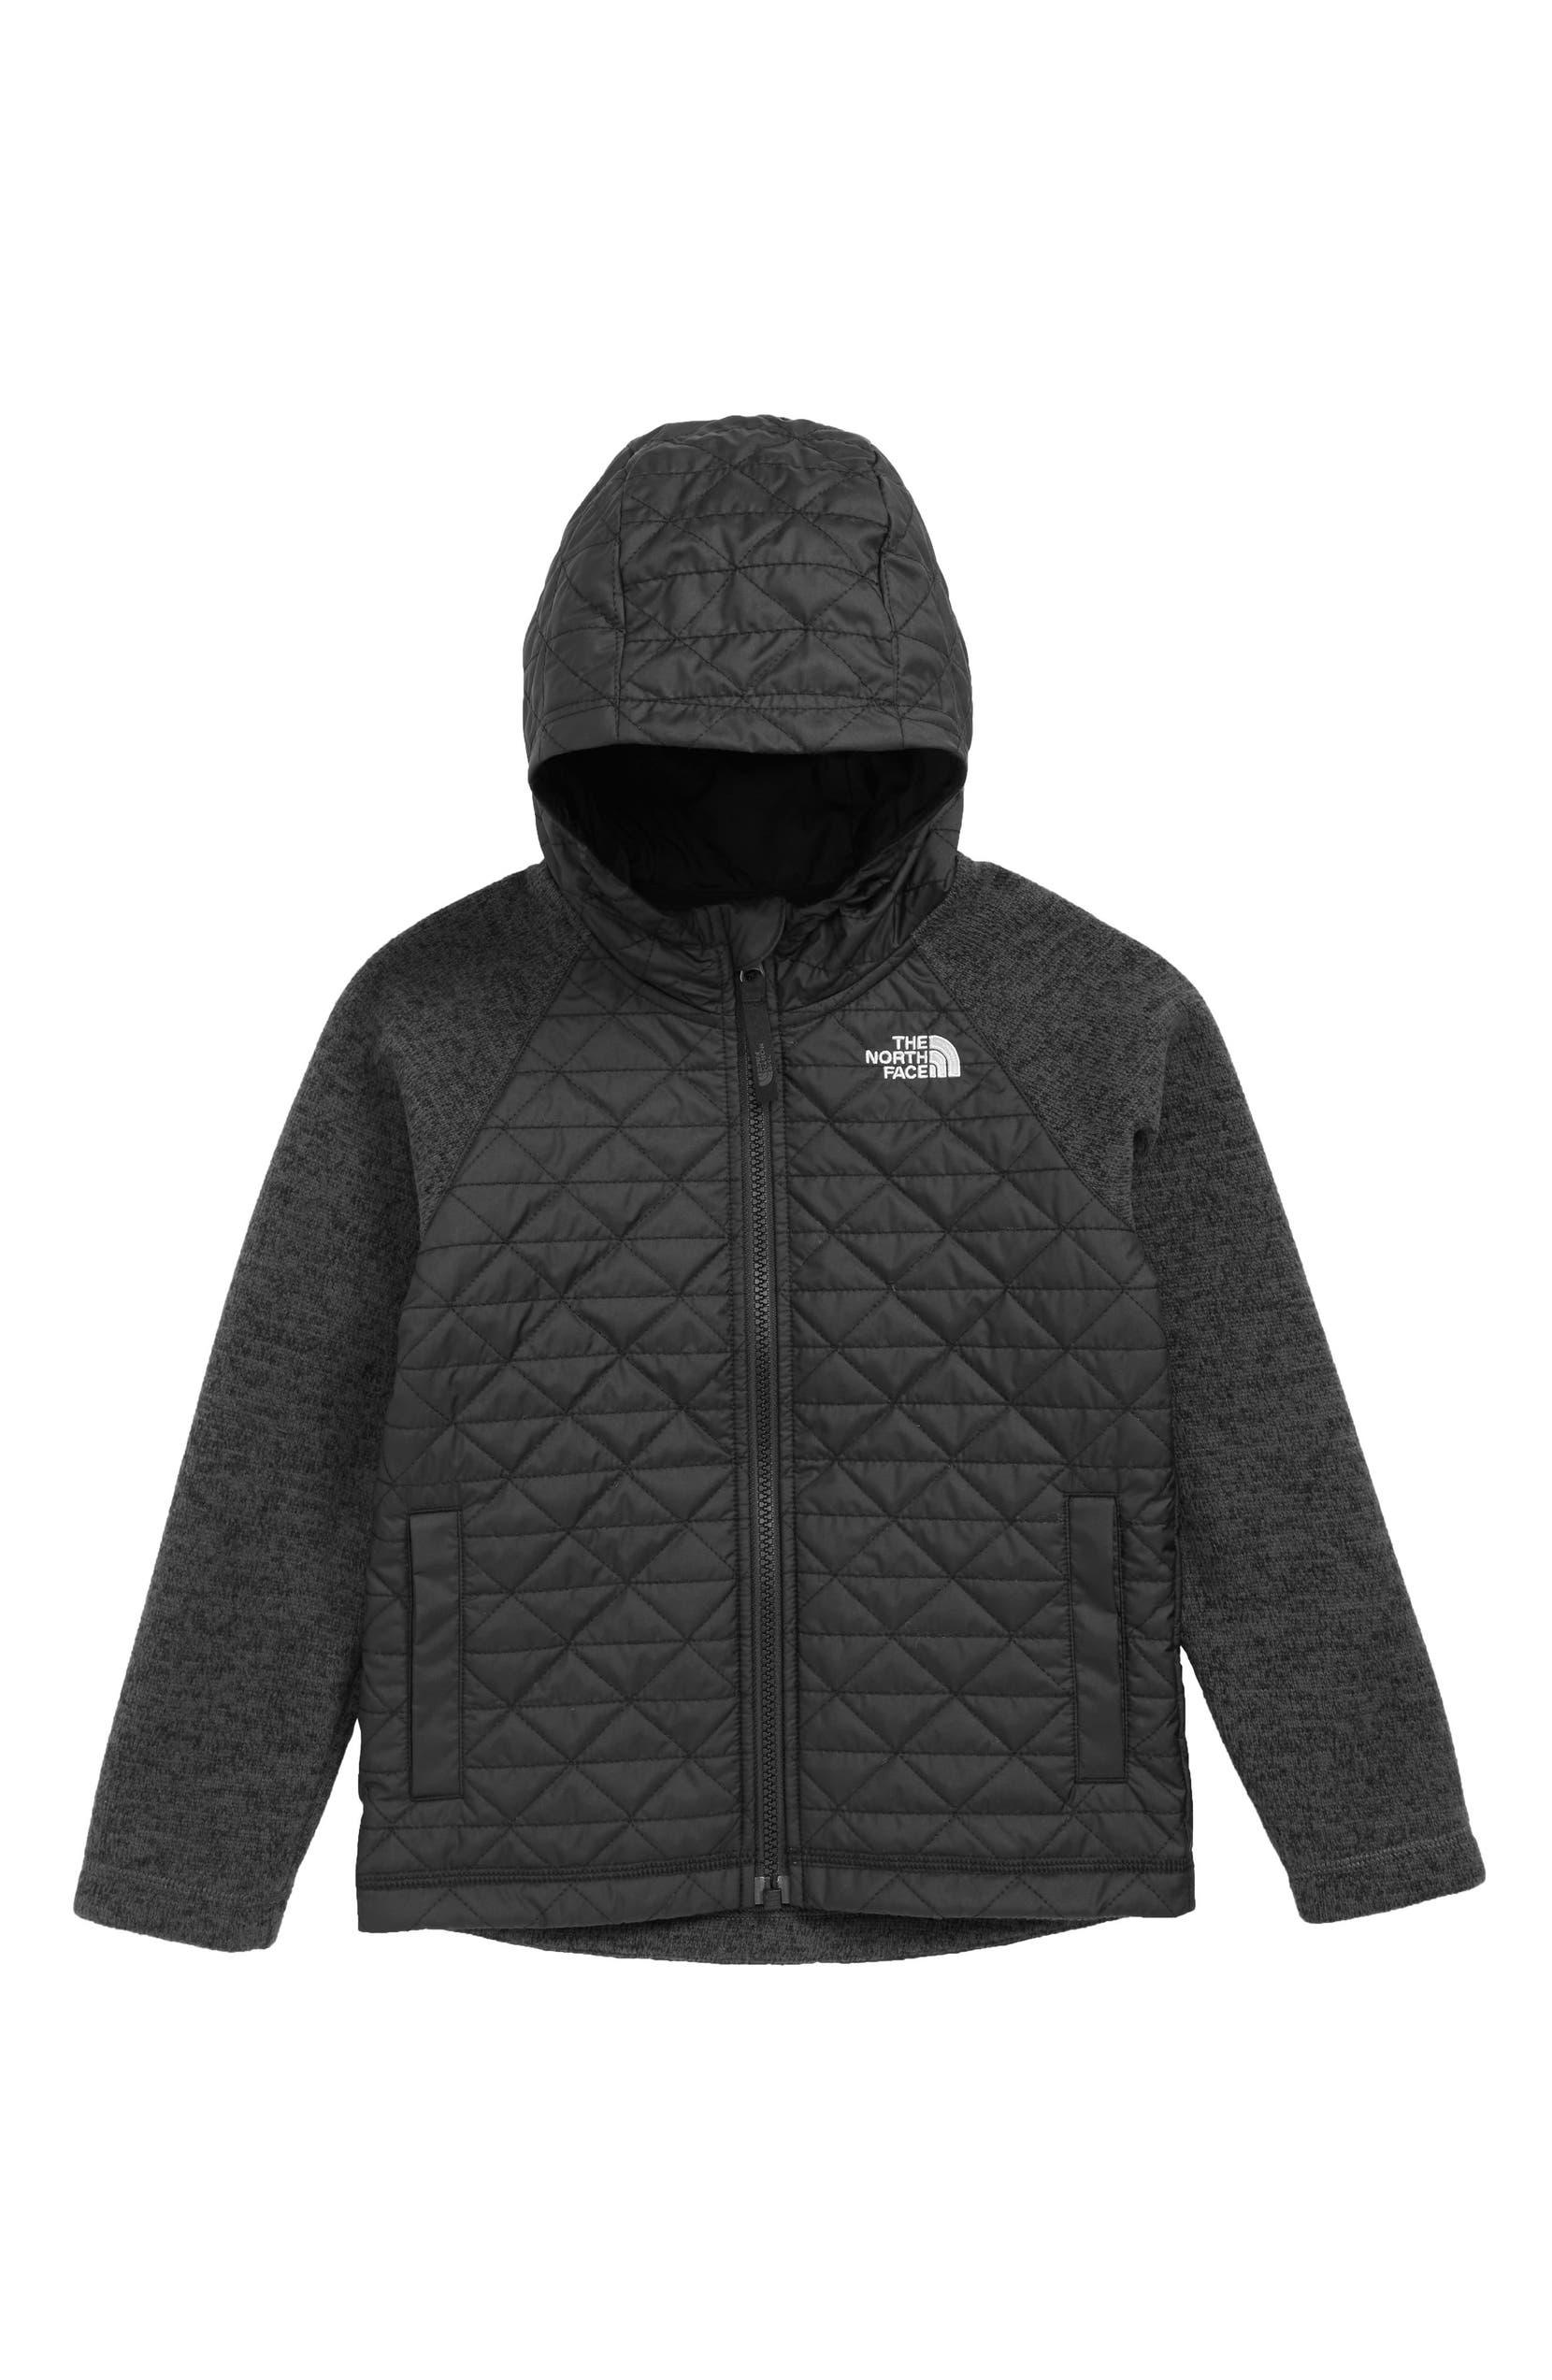 93507d5a2 Water Repellent Quilted Sweater Fleece Jacket